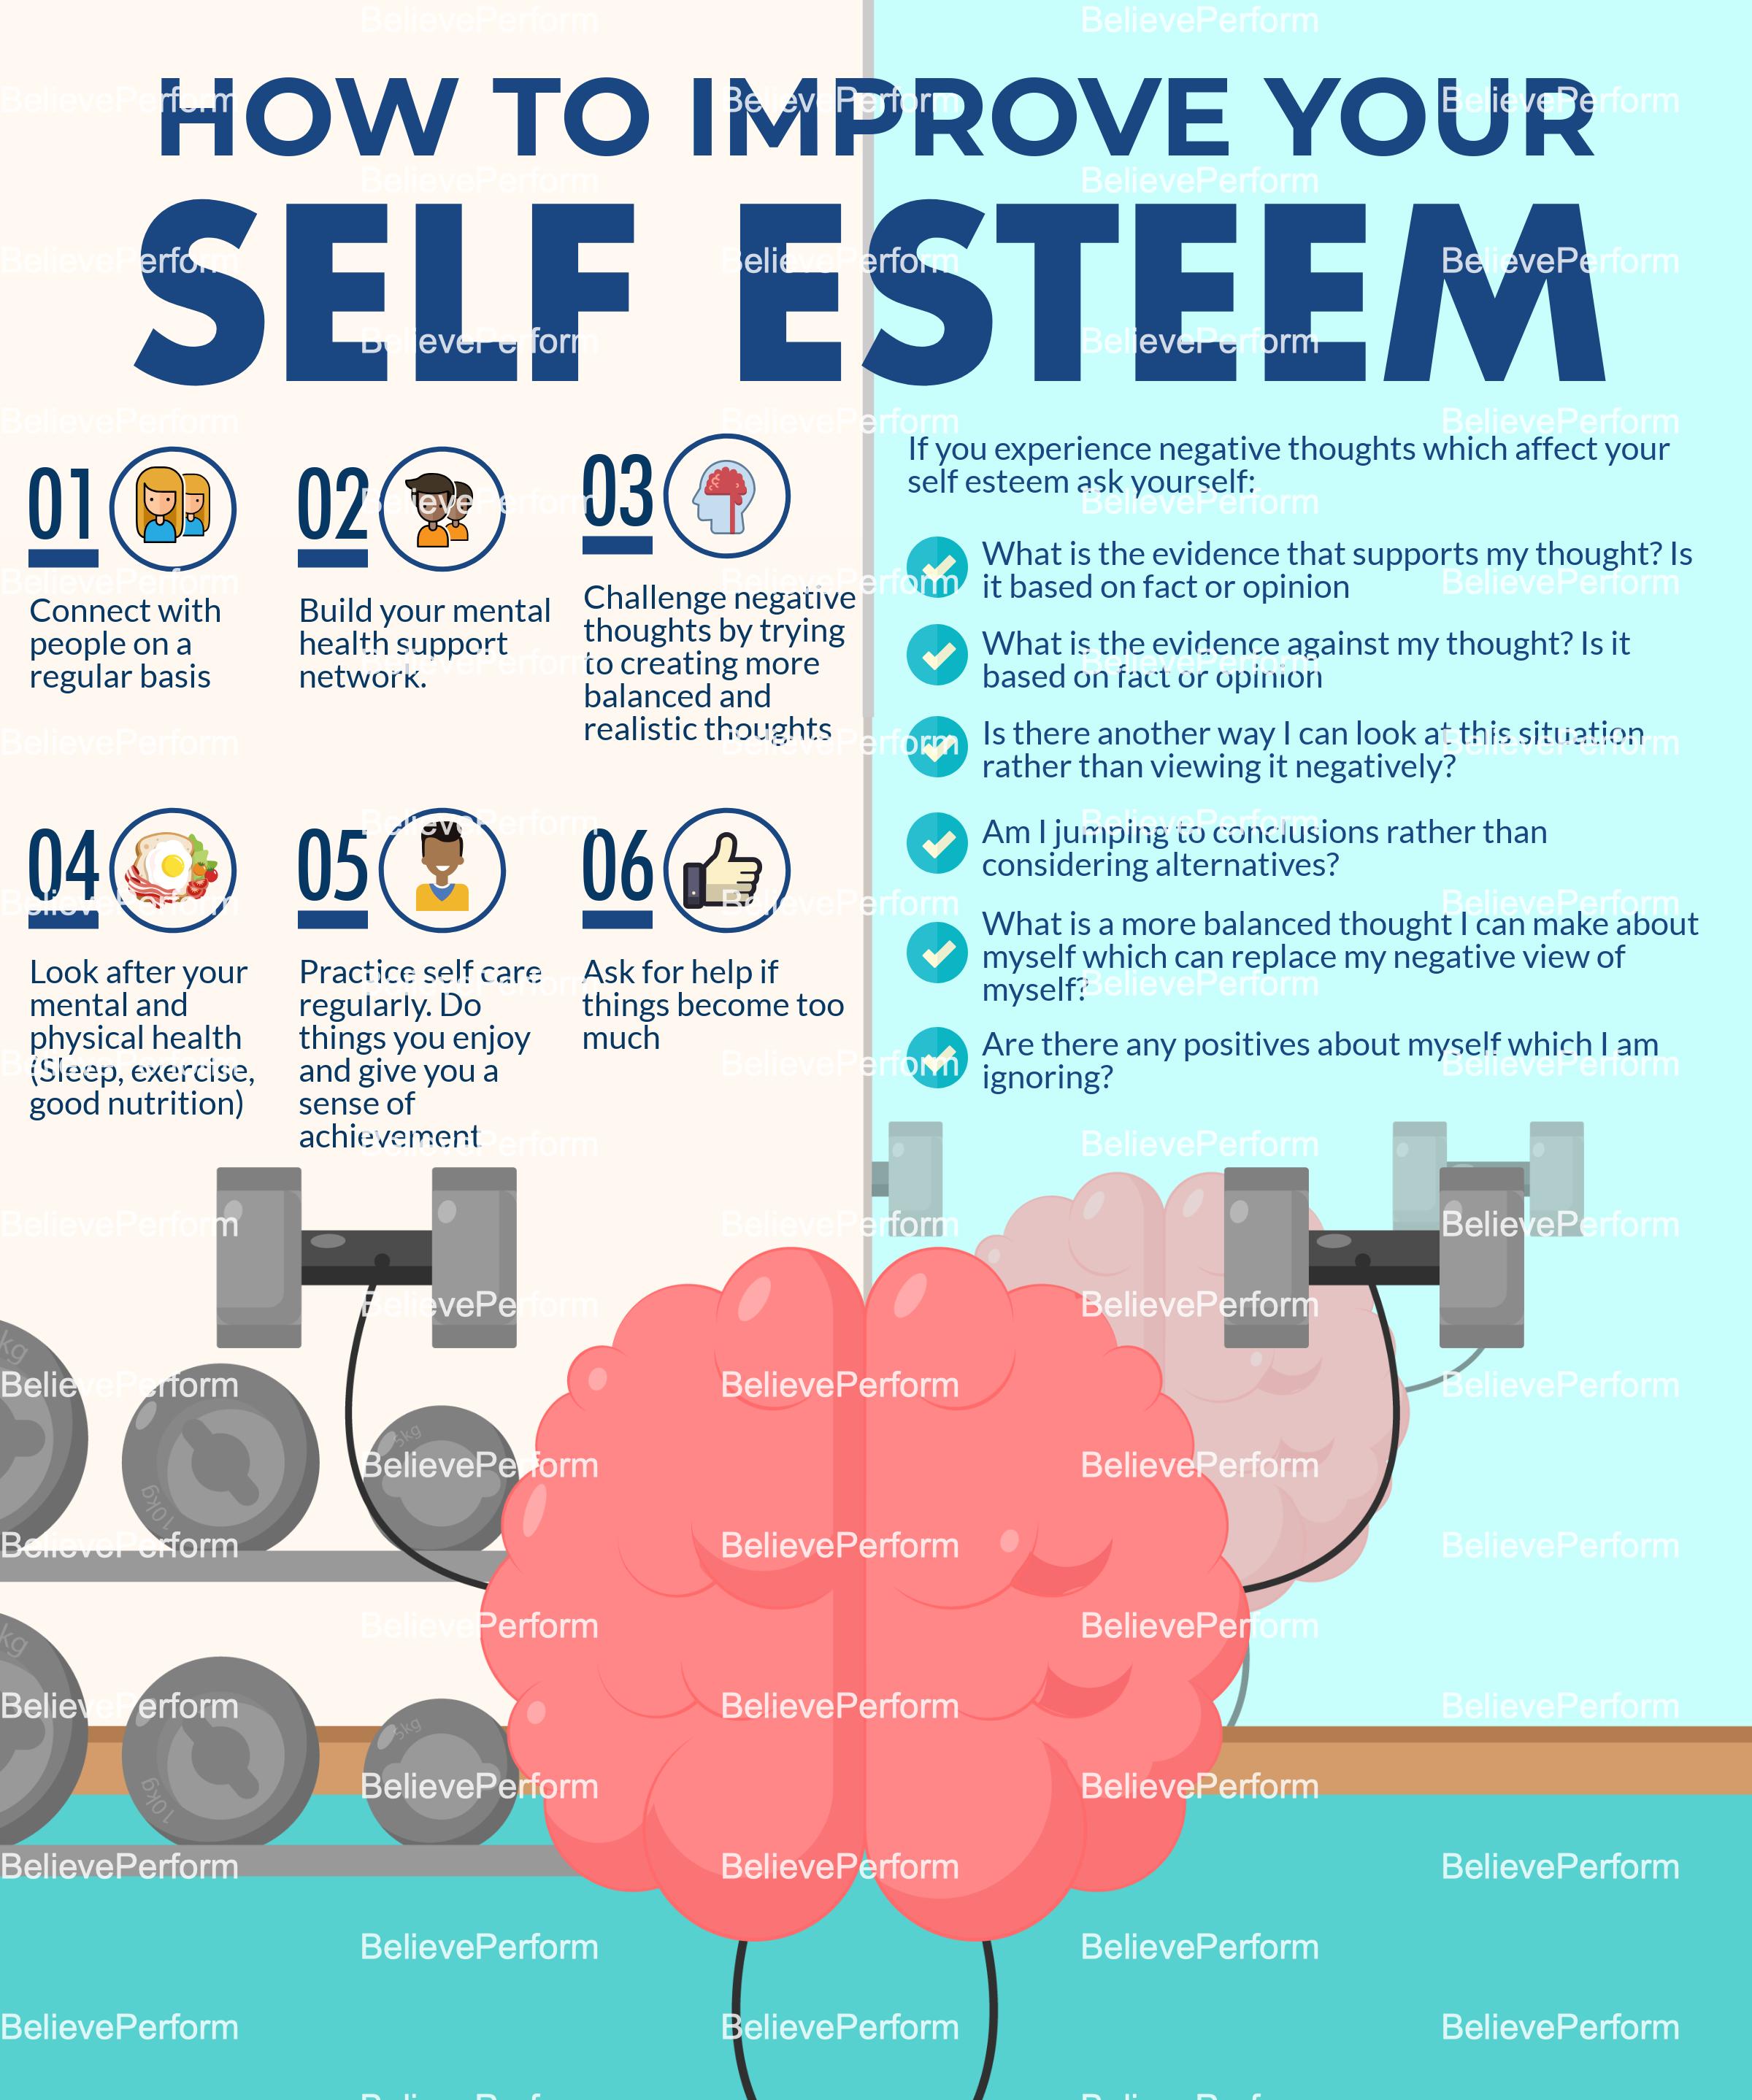 How to improve your self esteem - The UKs leading Sports